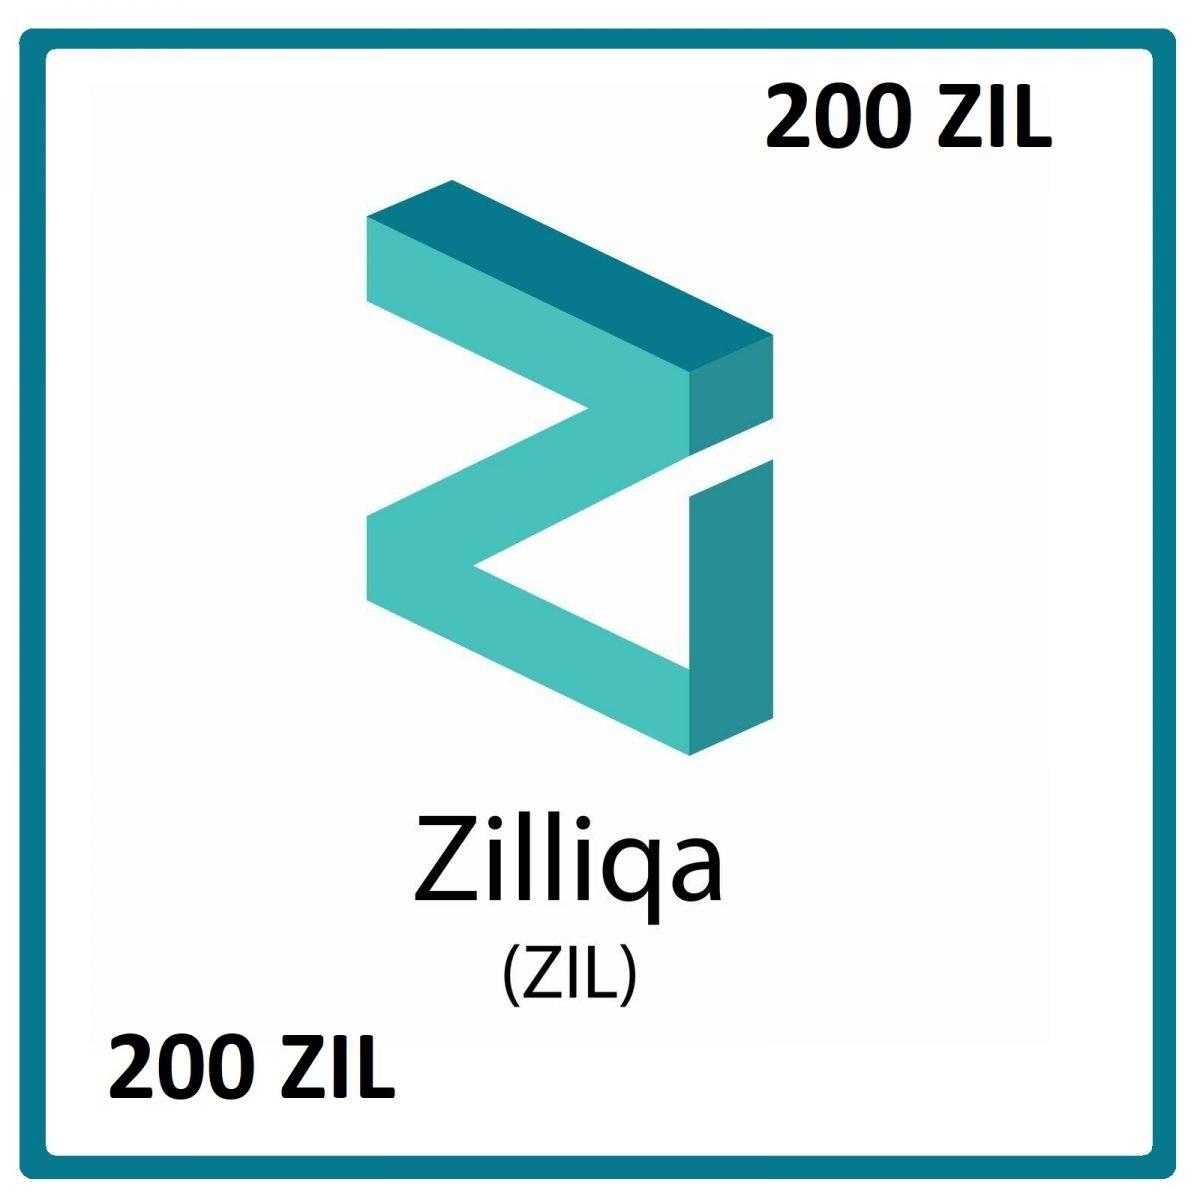 200 Zilliqa Mining Contract